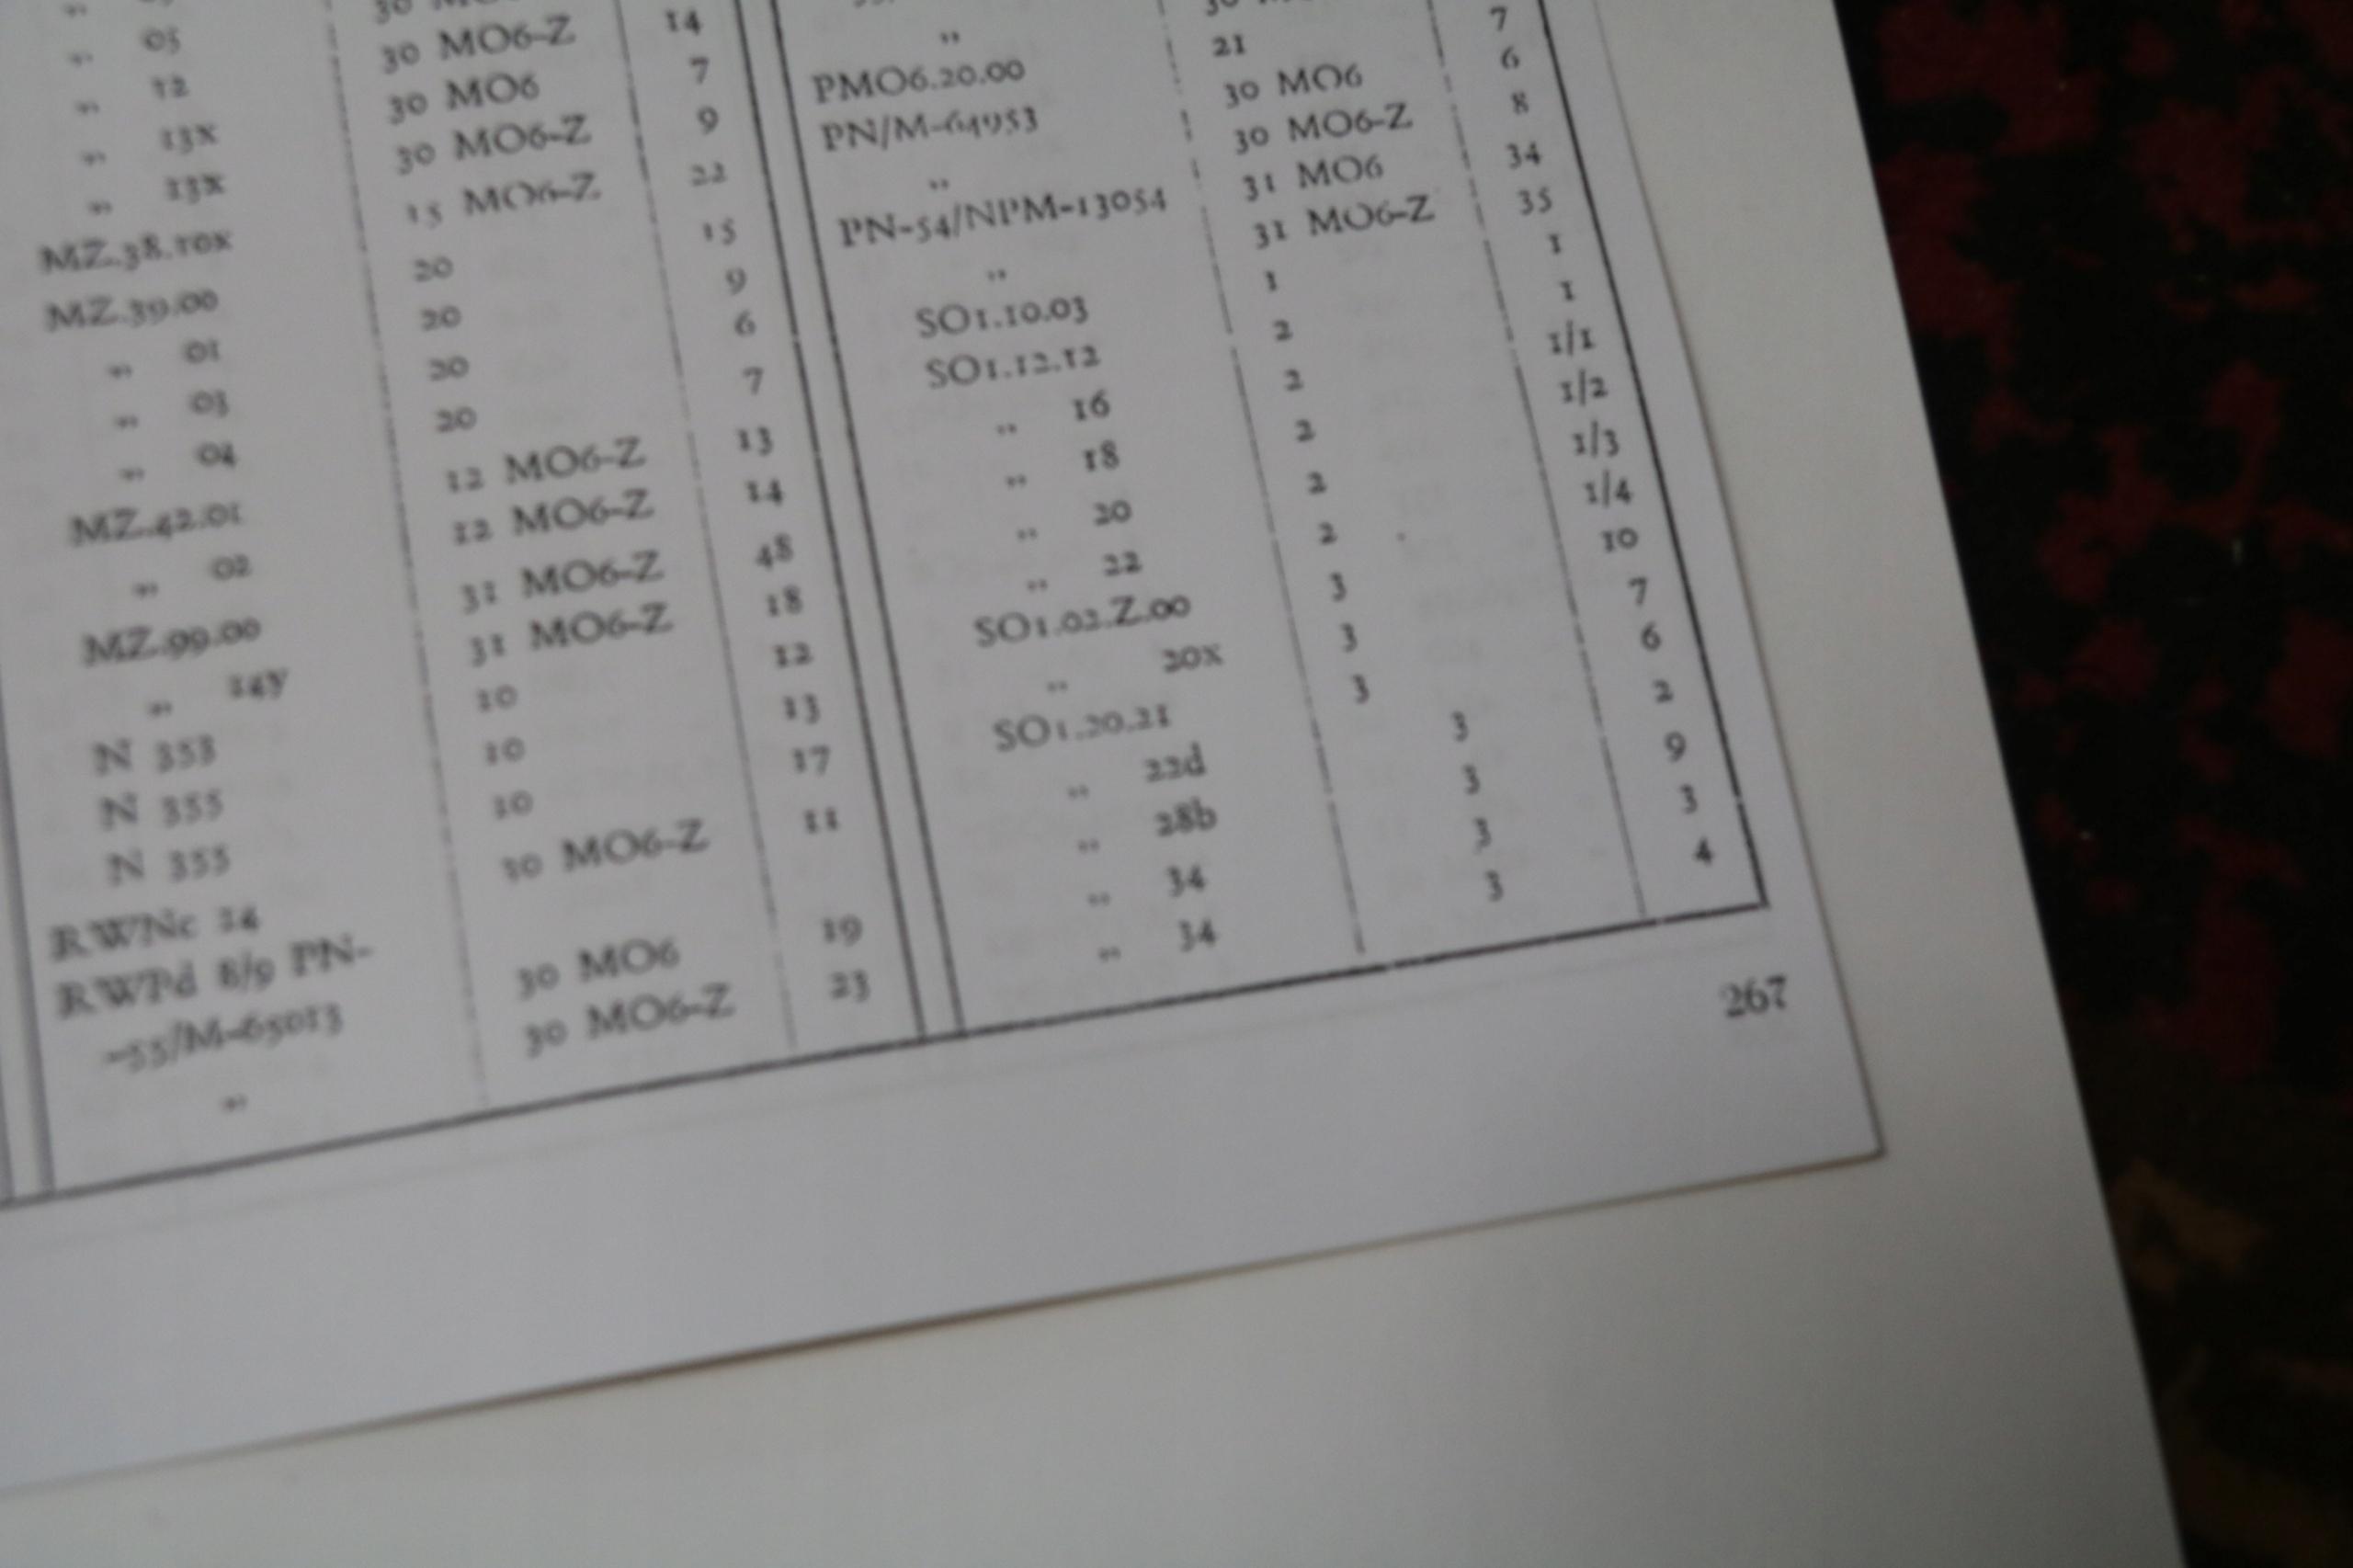 KATALIZATORIUS DALYS INSTRUKCIJA WSK 125 AZ 267 STRON !!!